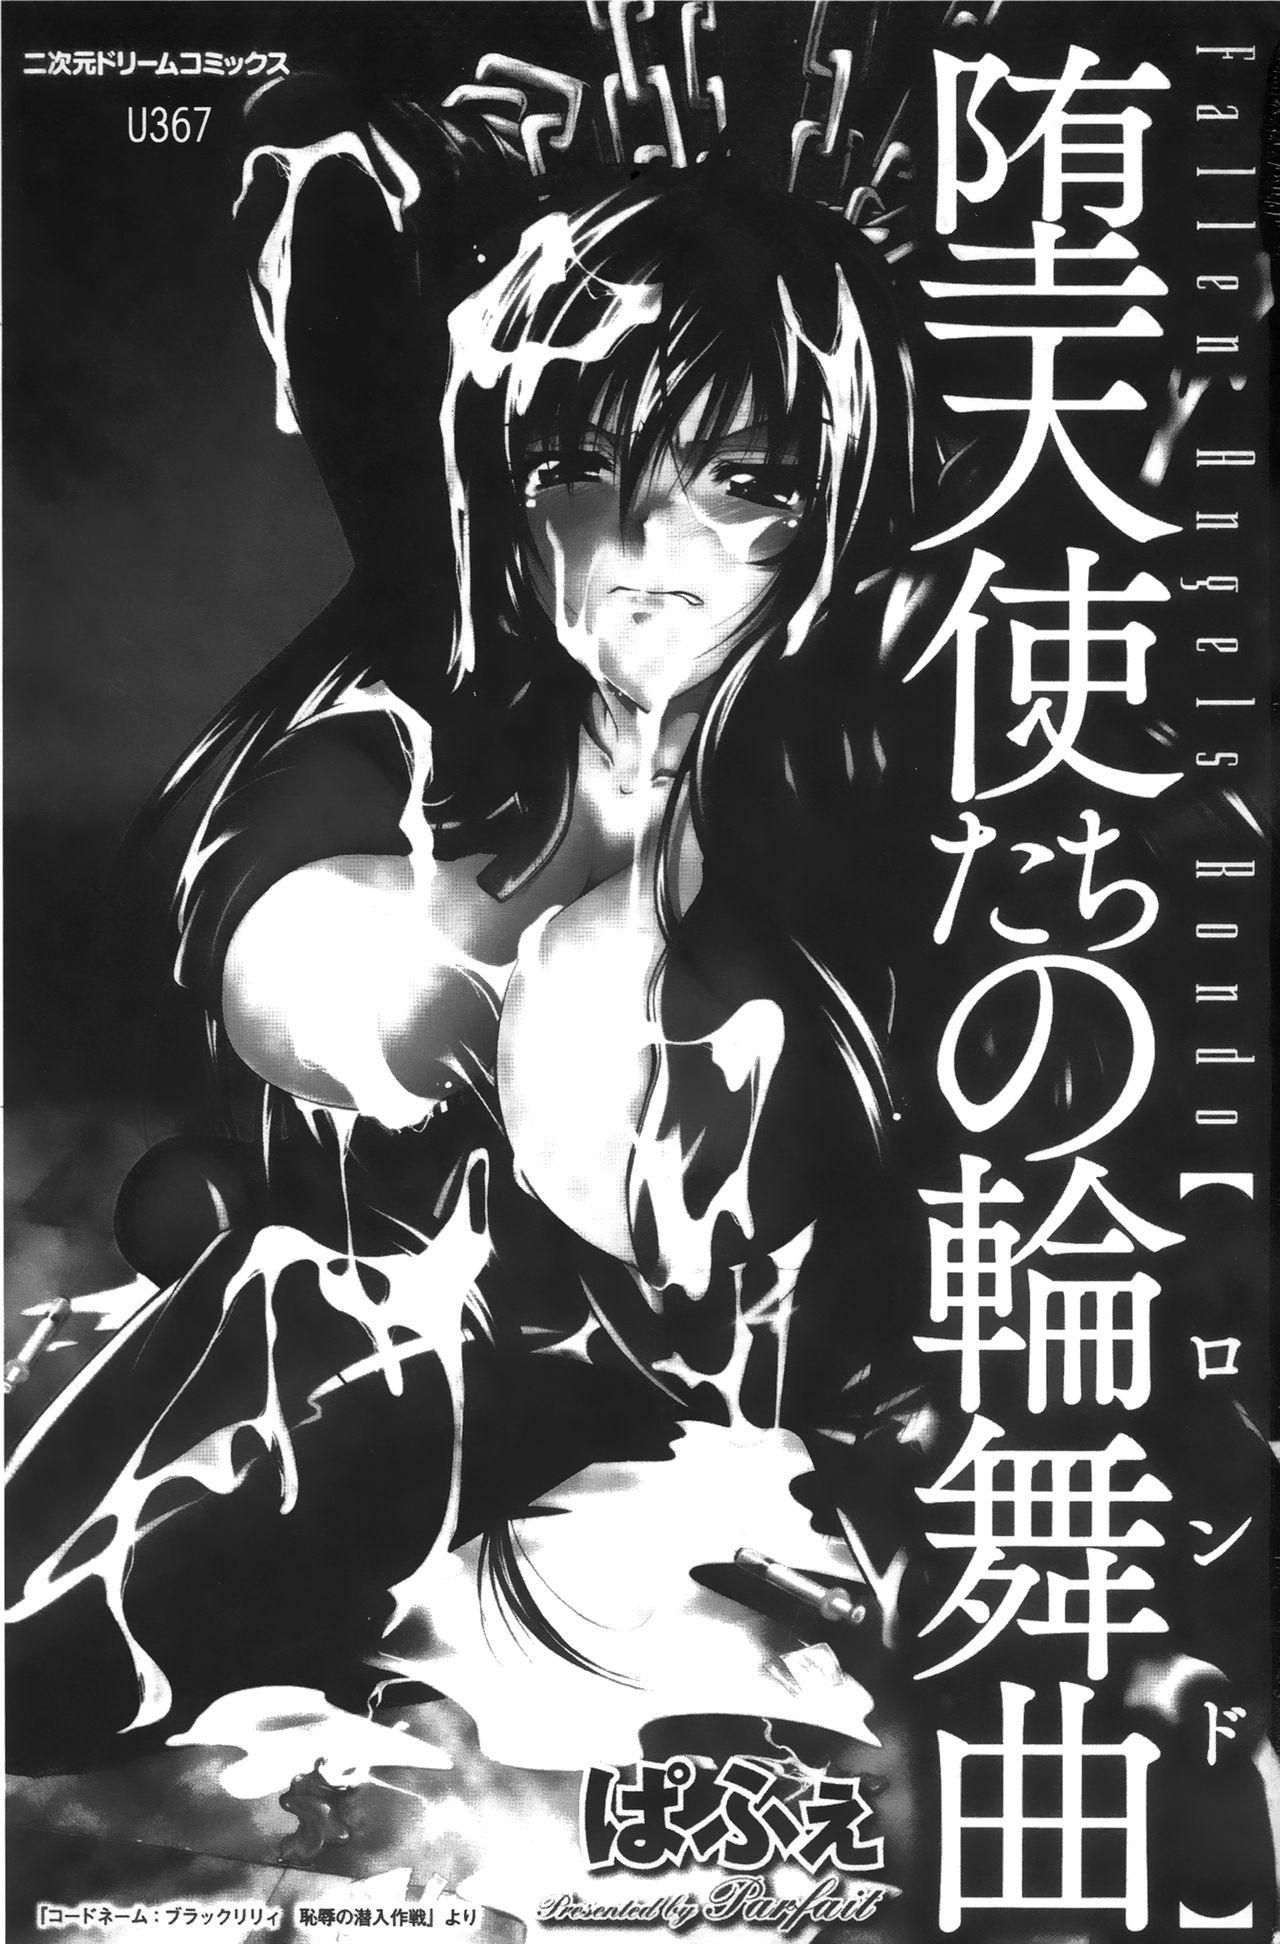 [Parfait] Datenshi-tachi no Rondo - Fallen Angels Rondo   墮天使們的圓舞曲 [Chinese] 1